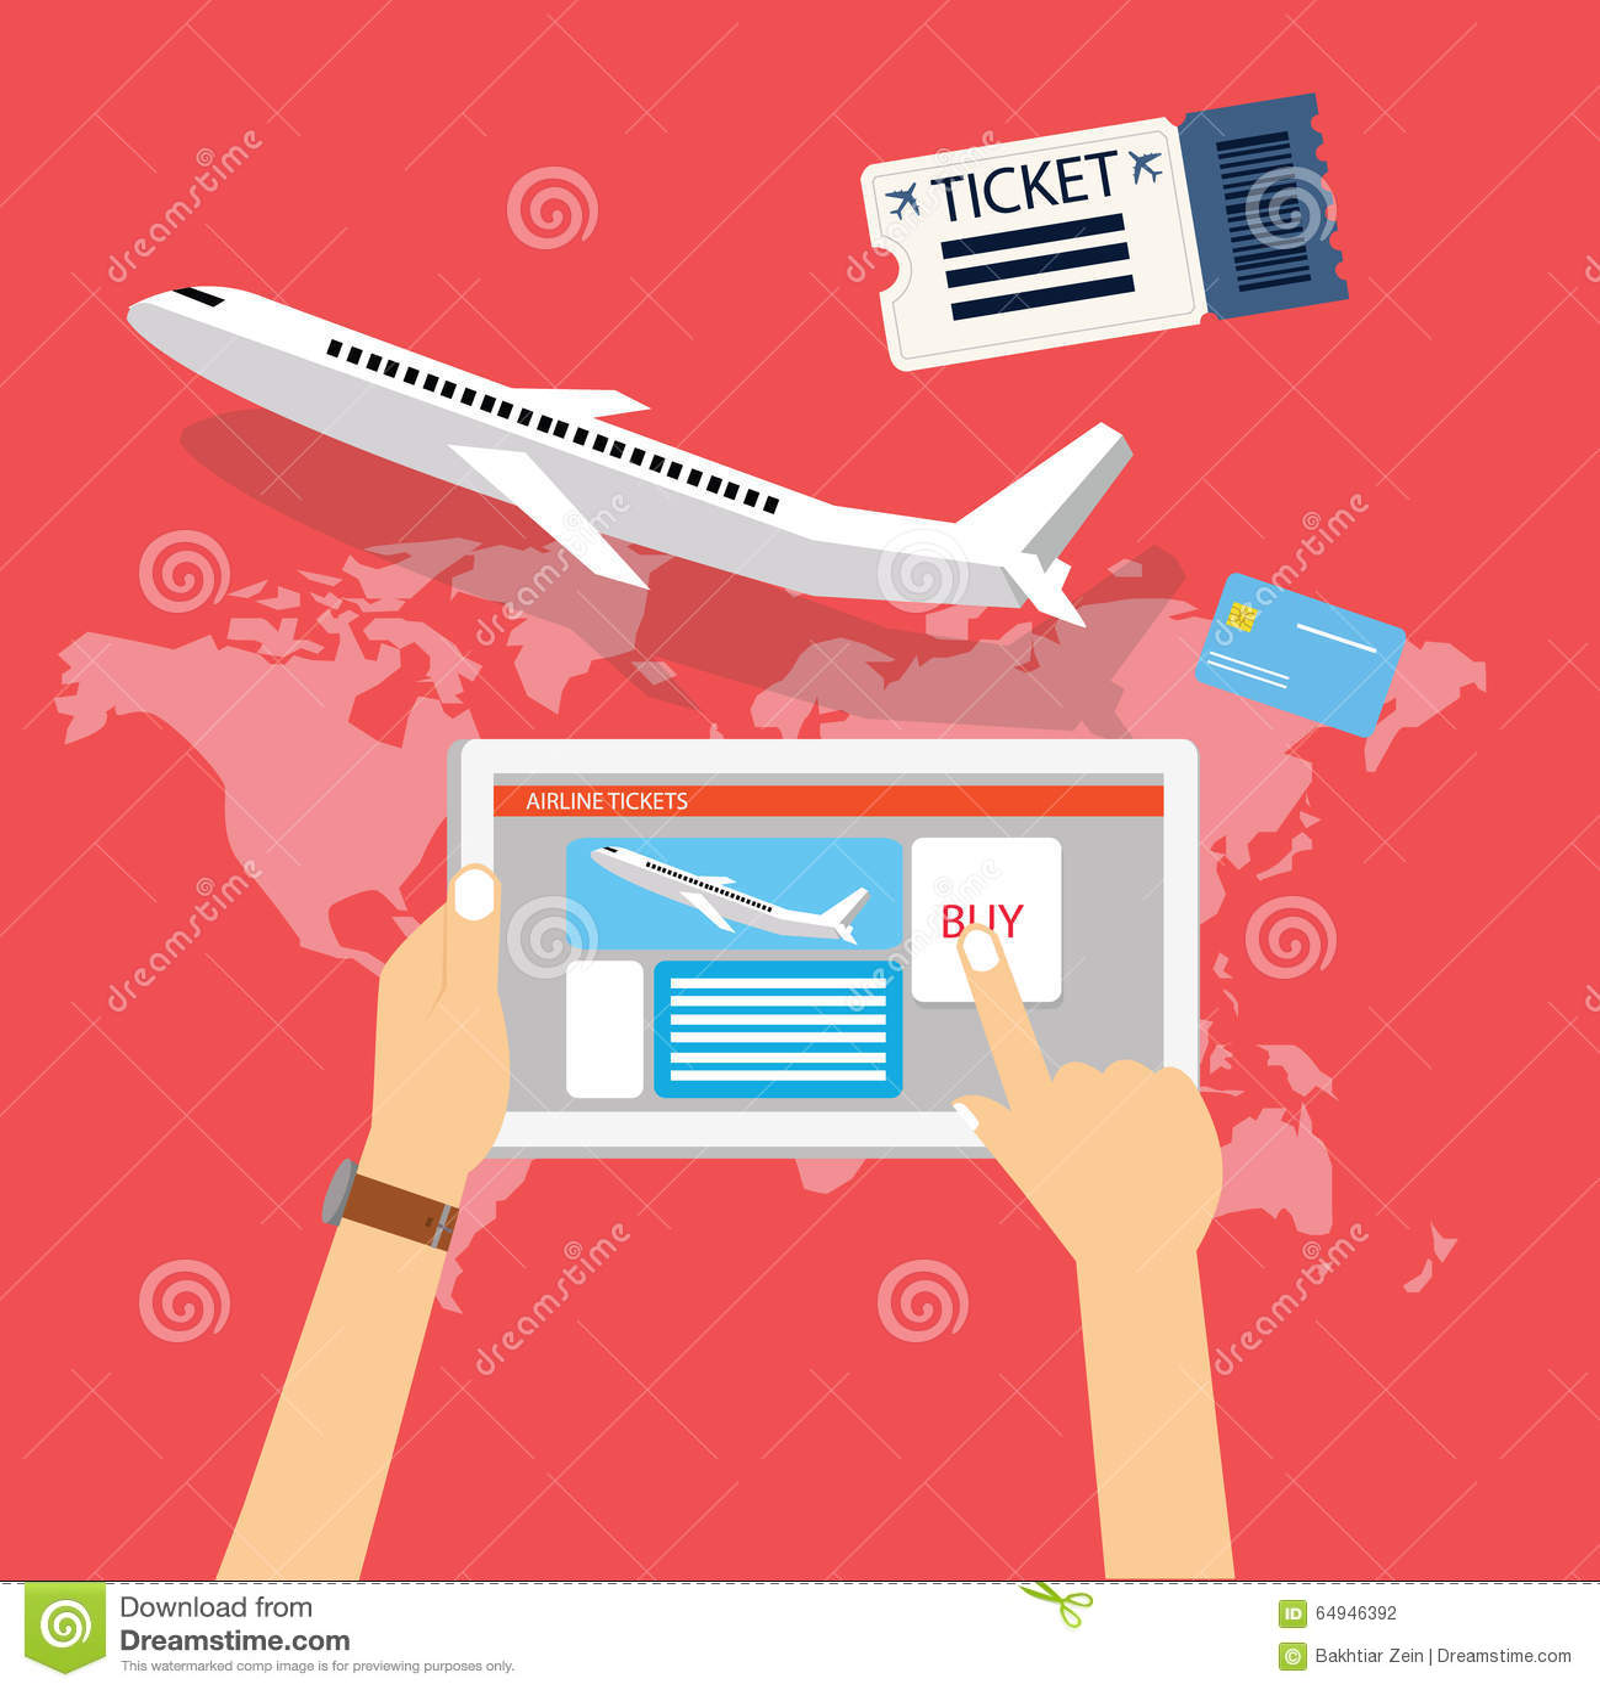 Buy From: Book Buy Plane Flight Ticket Online Via Internet For